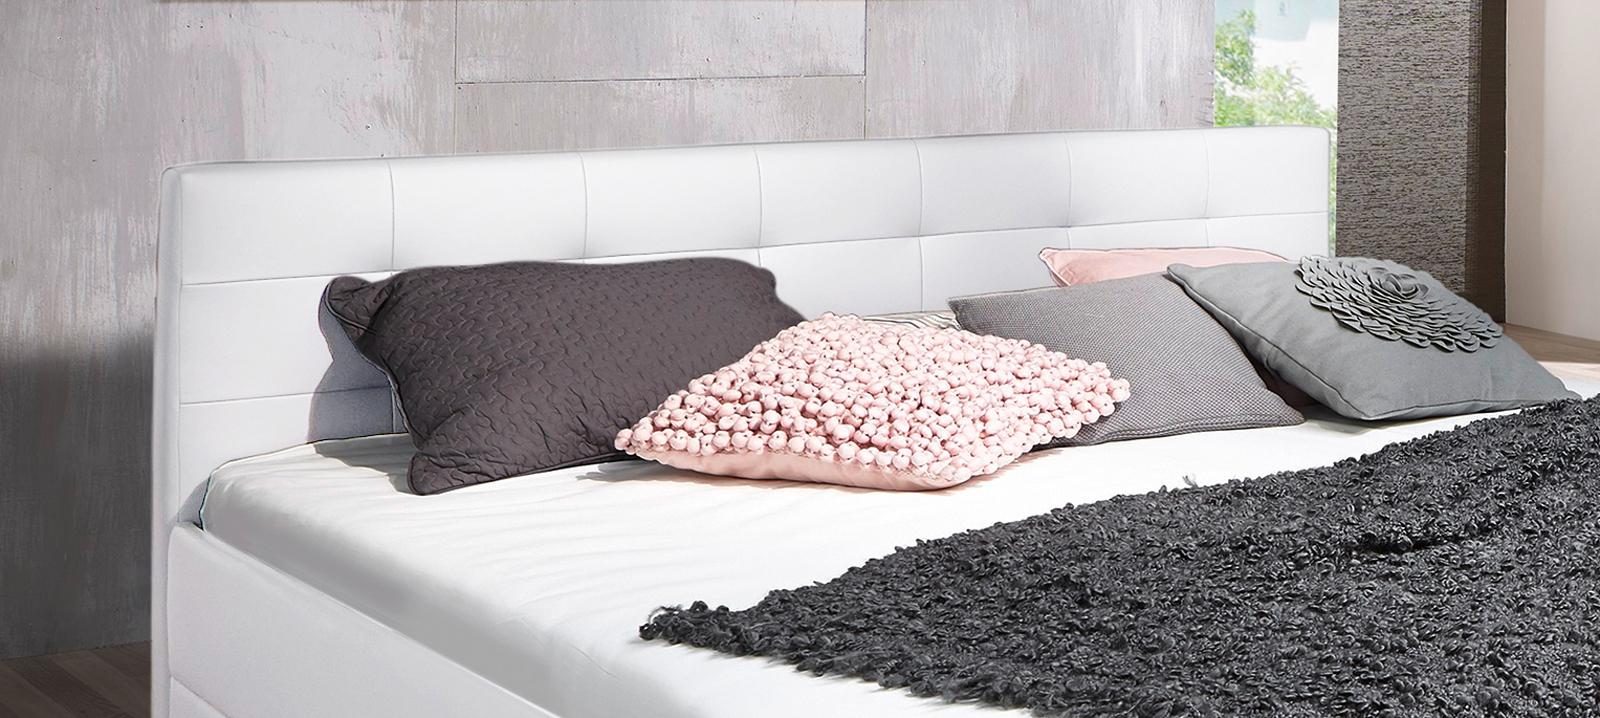 sam design boxspringbett 140 x 200 cm farbauswahl kappa. Black Bedroom Furniture Sets. Home Design Ideas